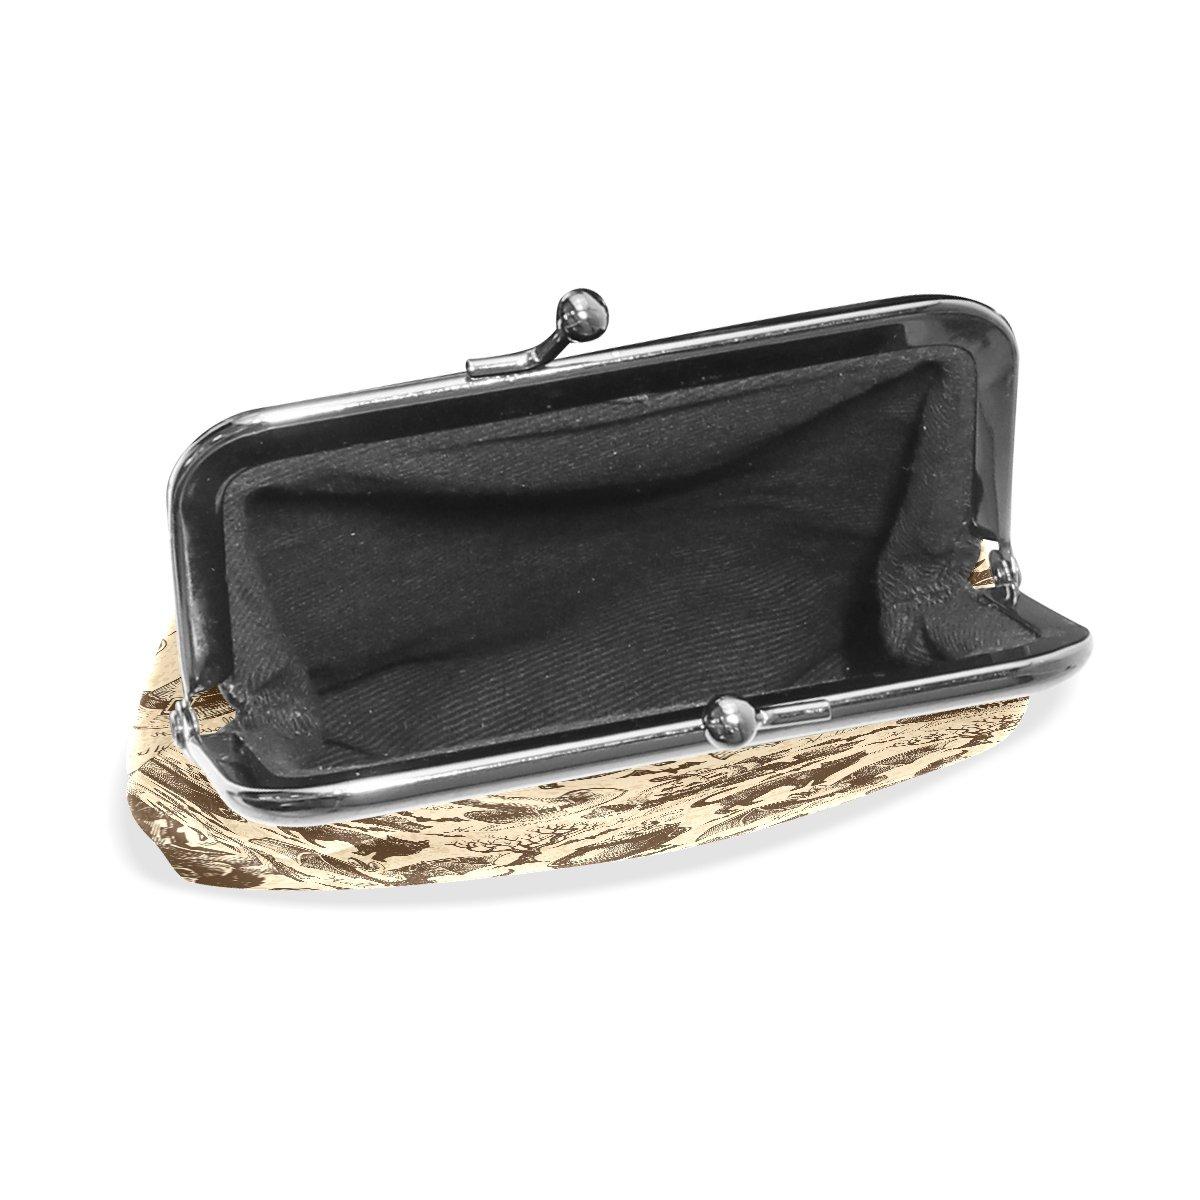 AURELIOR Vintage Halloween Black Cat Bat Coin Purse Change Cash Bag Small Purse Wallets for Women Girl